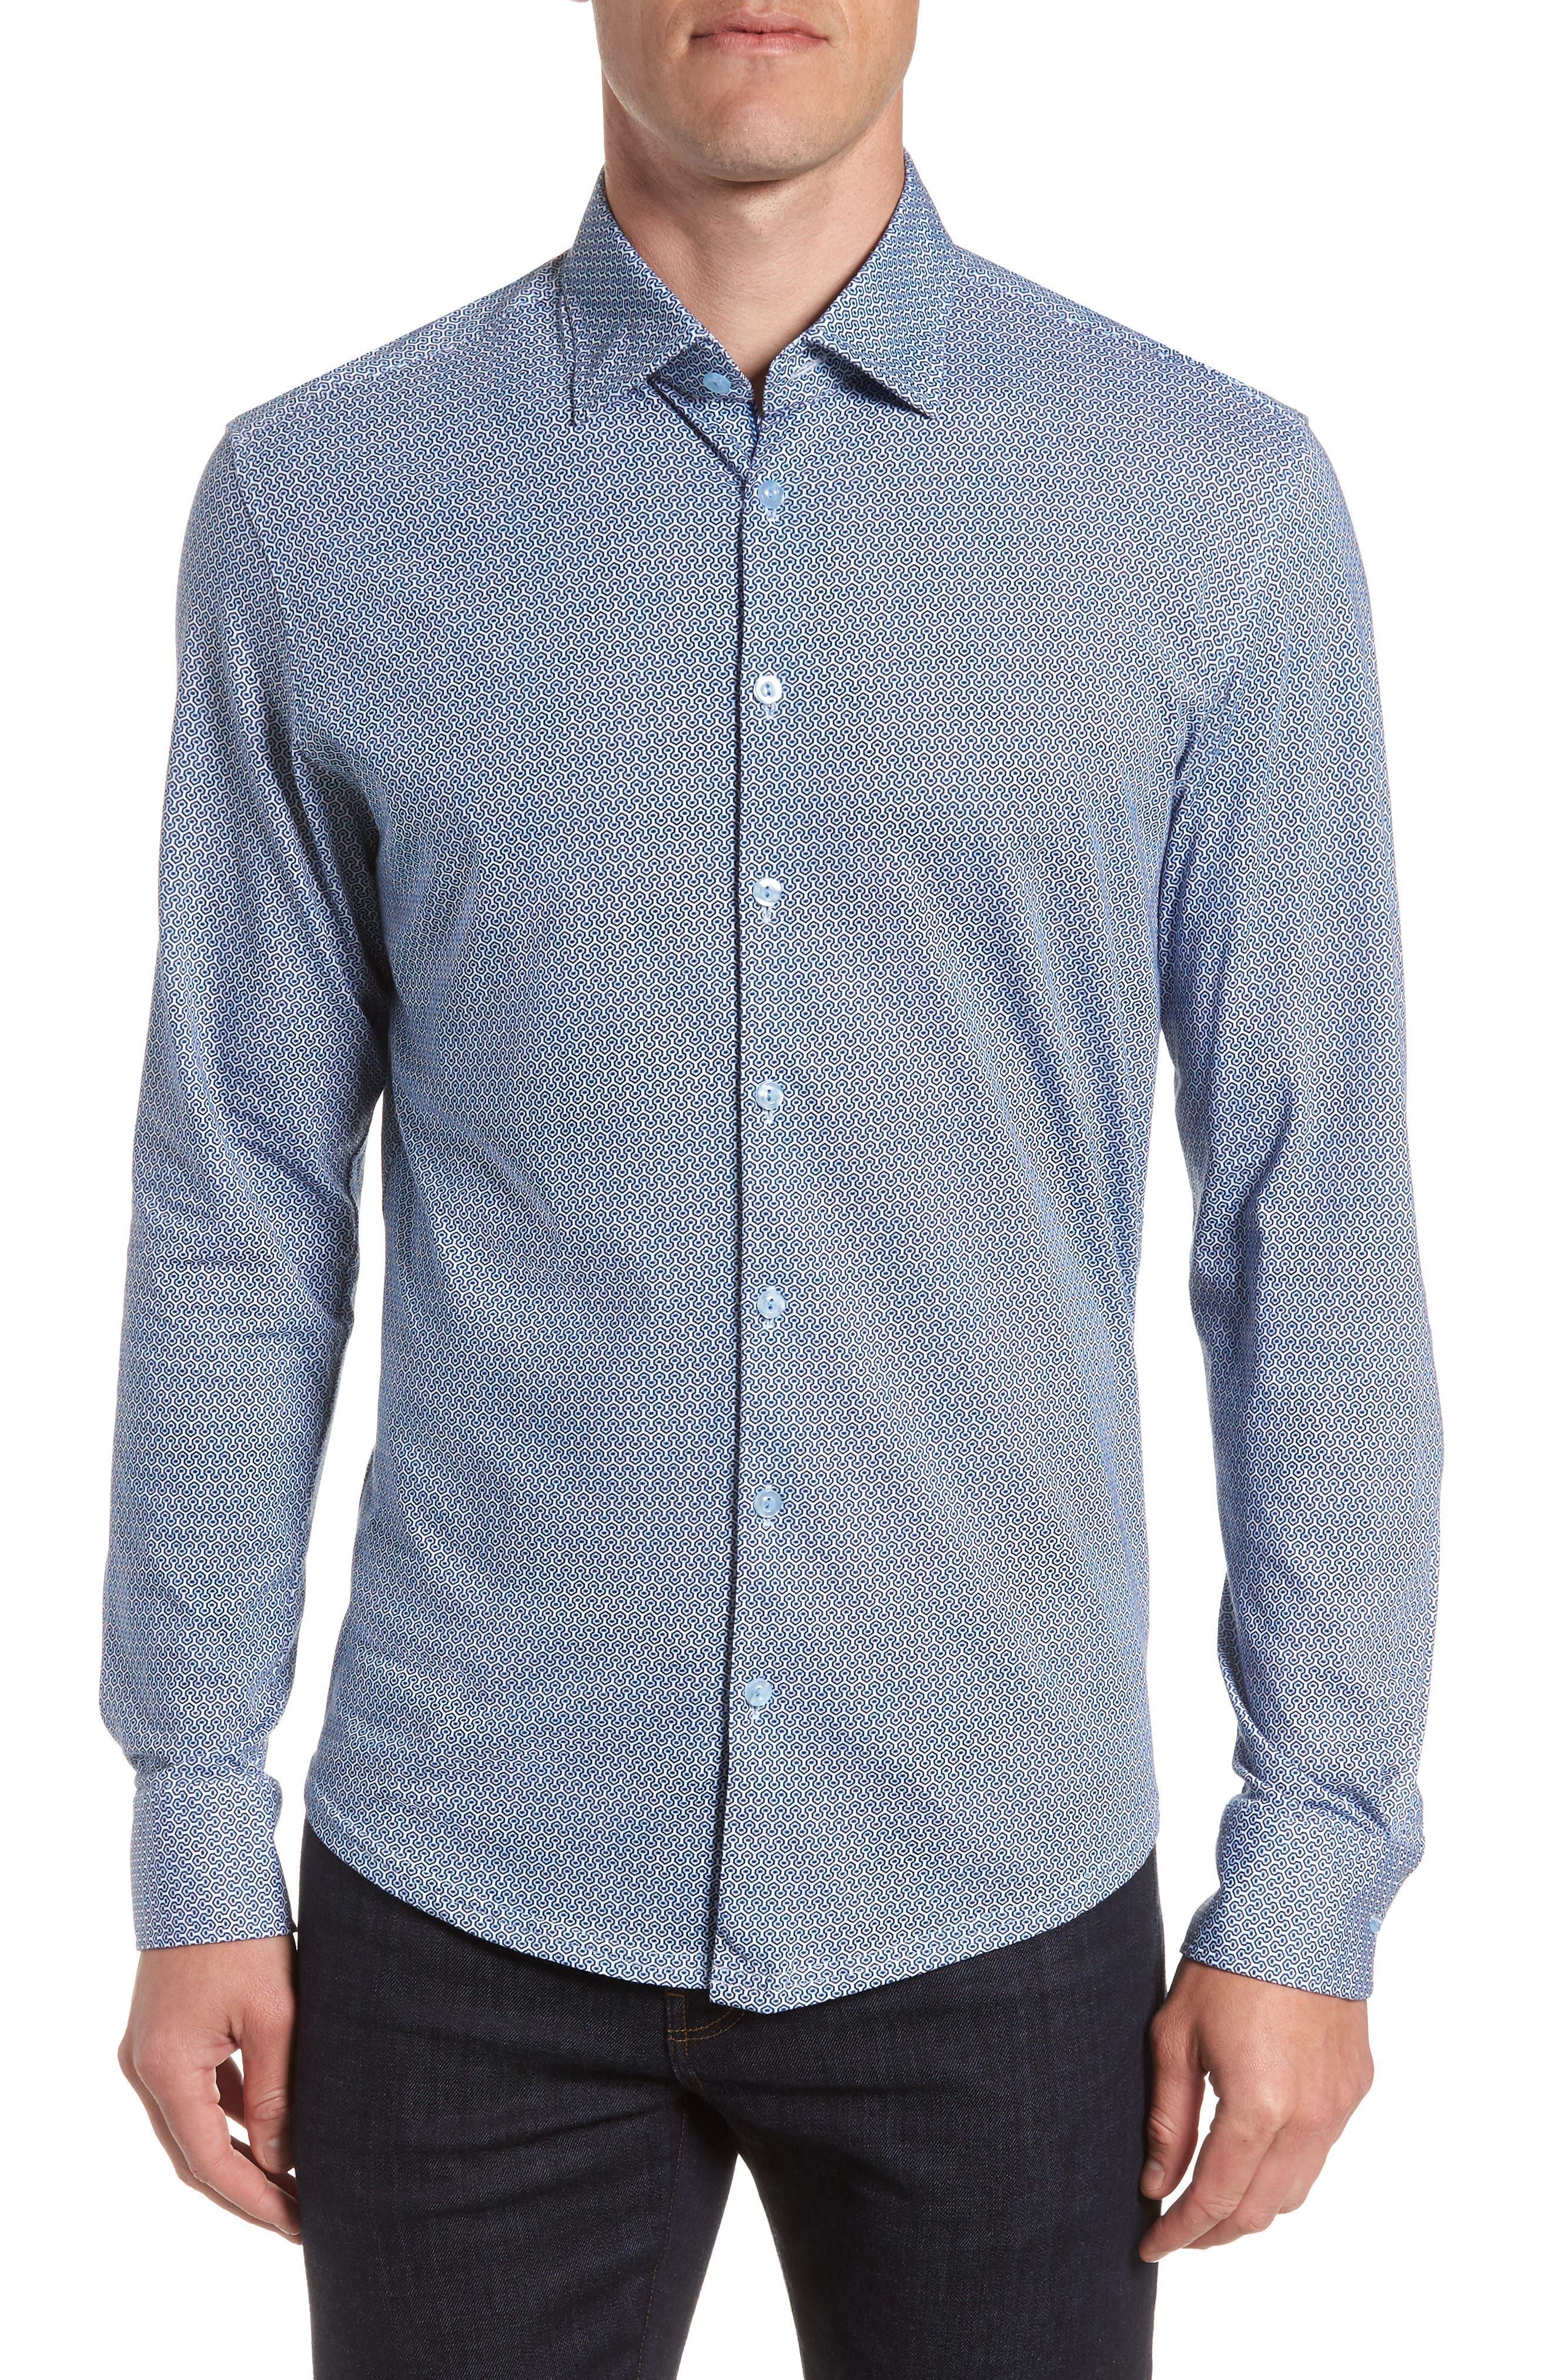 Honeycomb Print Knit Sport Shirt,                             Main thumbnail 1, color,                             Blue